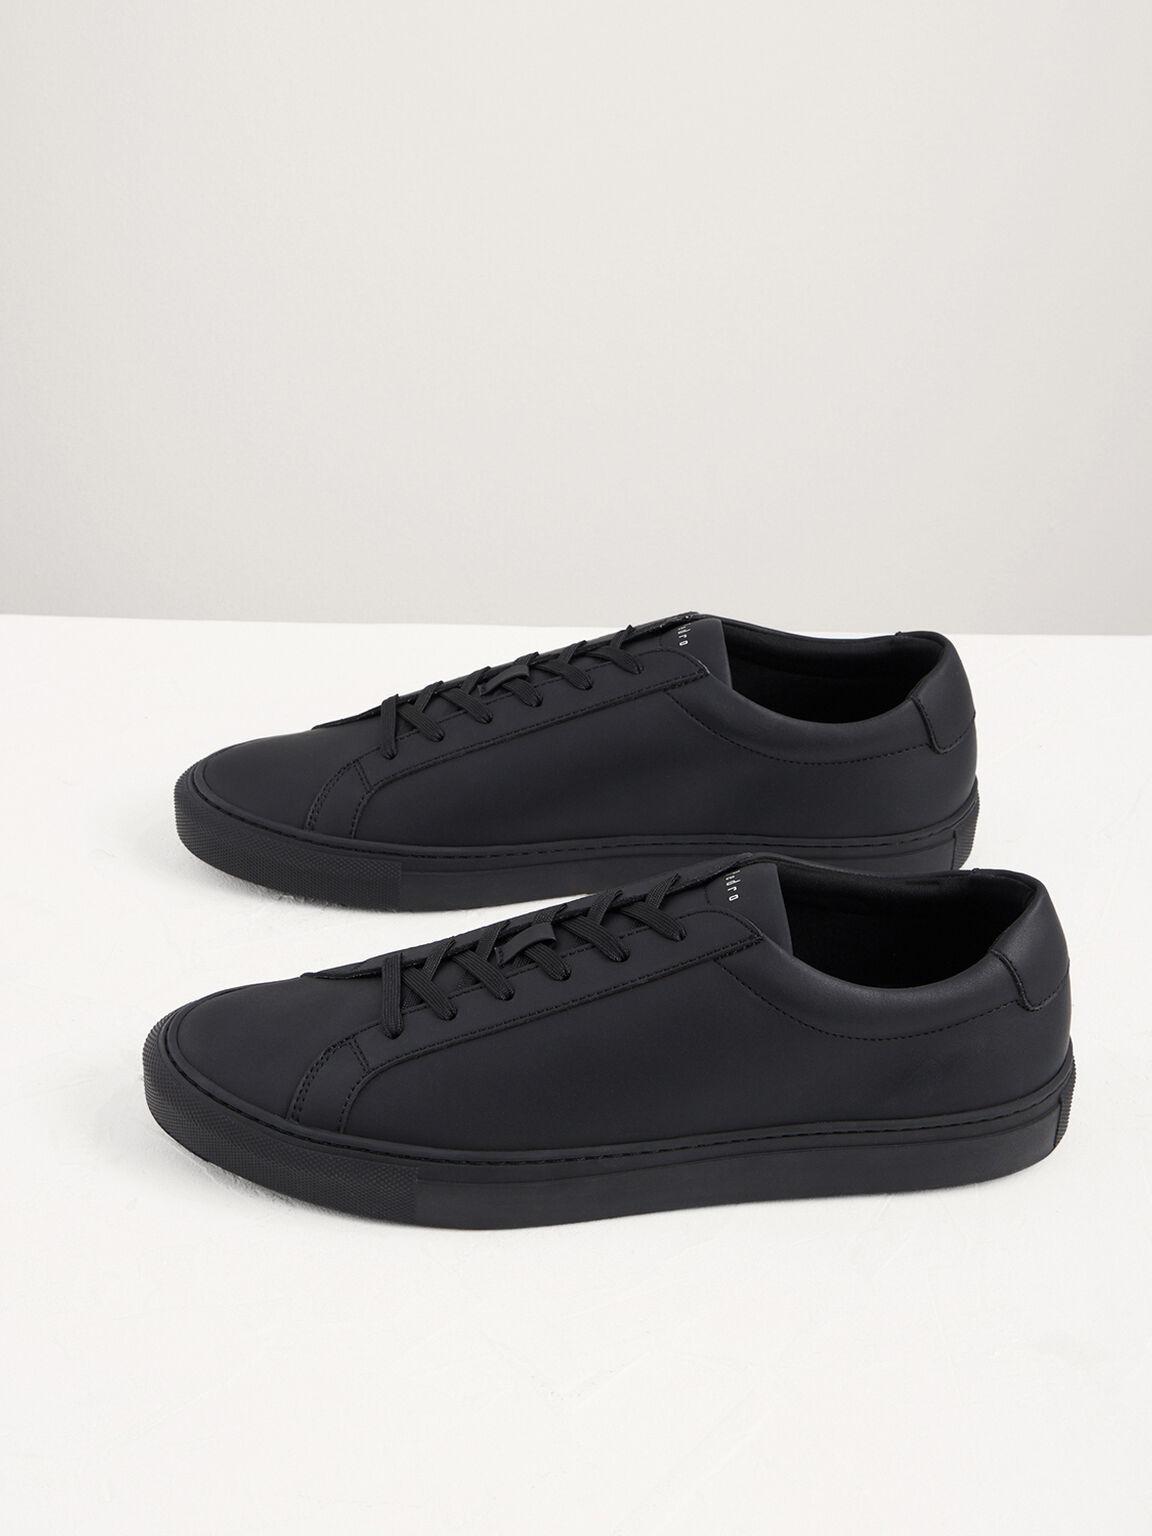 Casual Court Sneakers, Black, hi-res